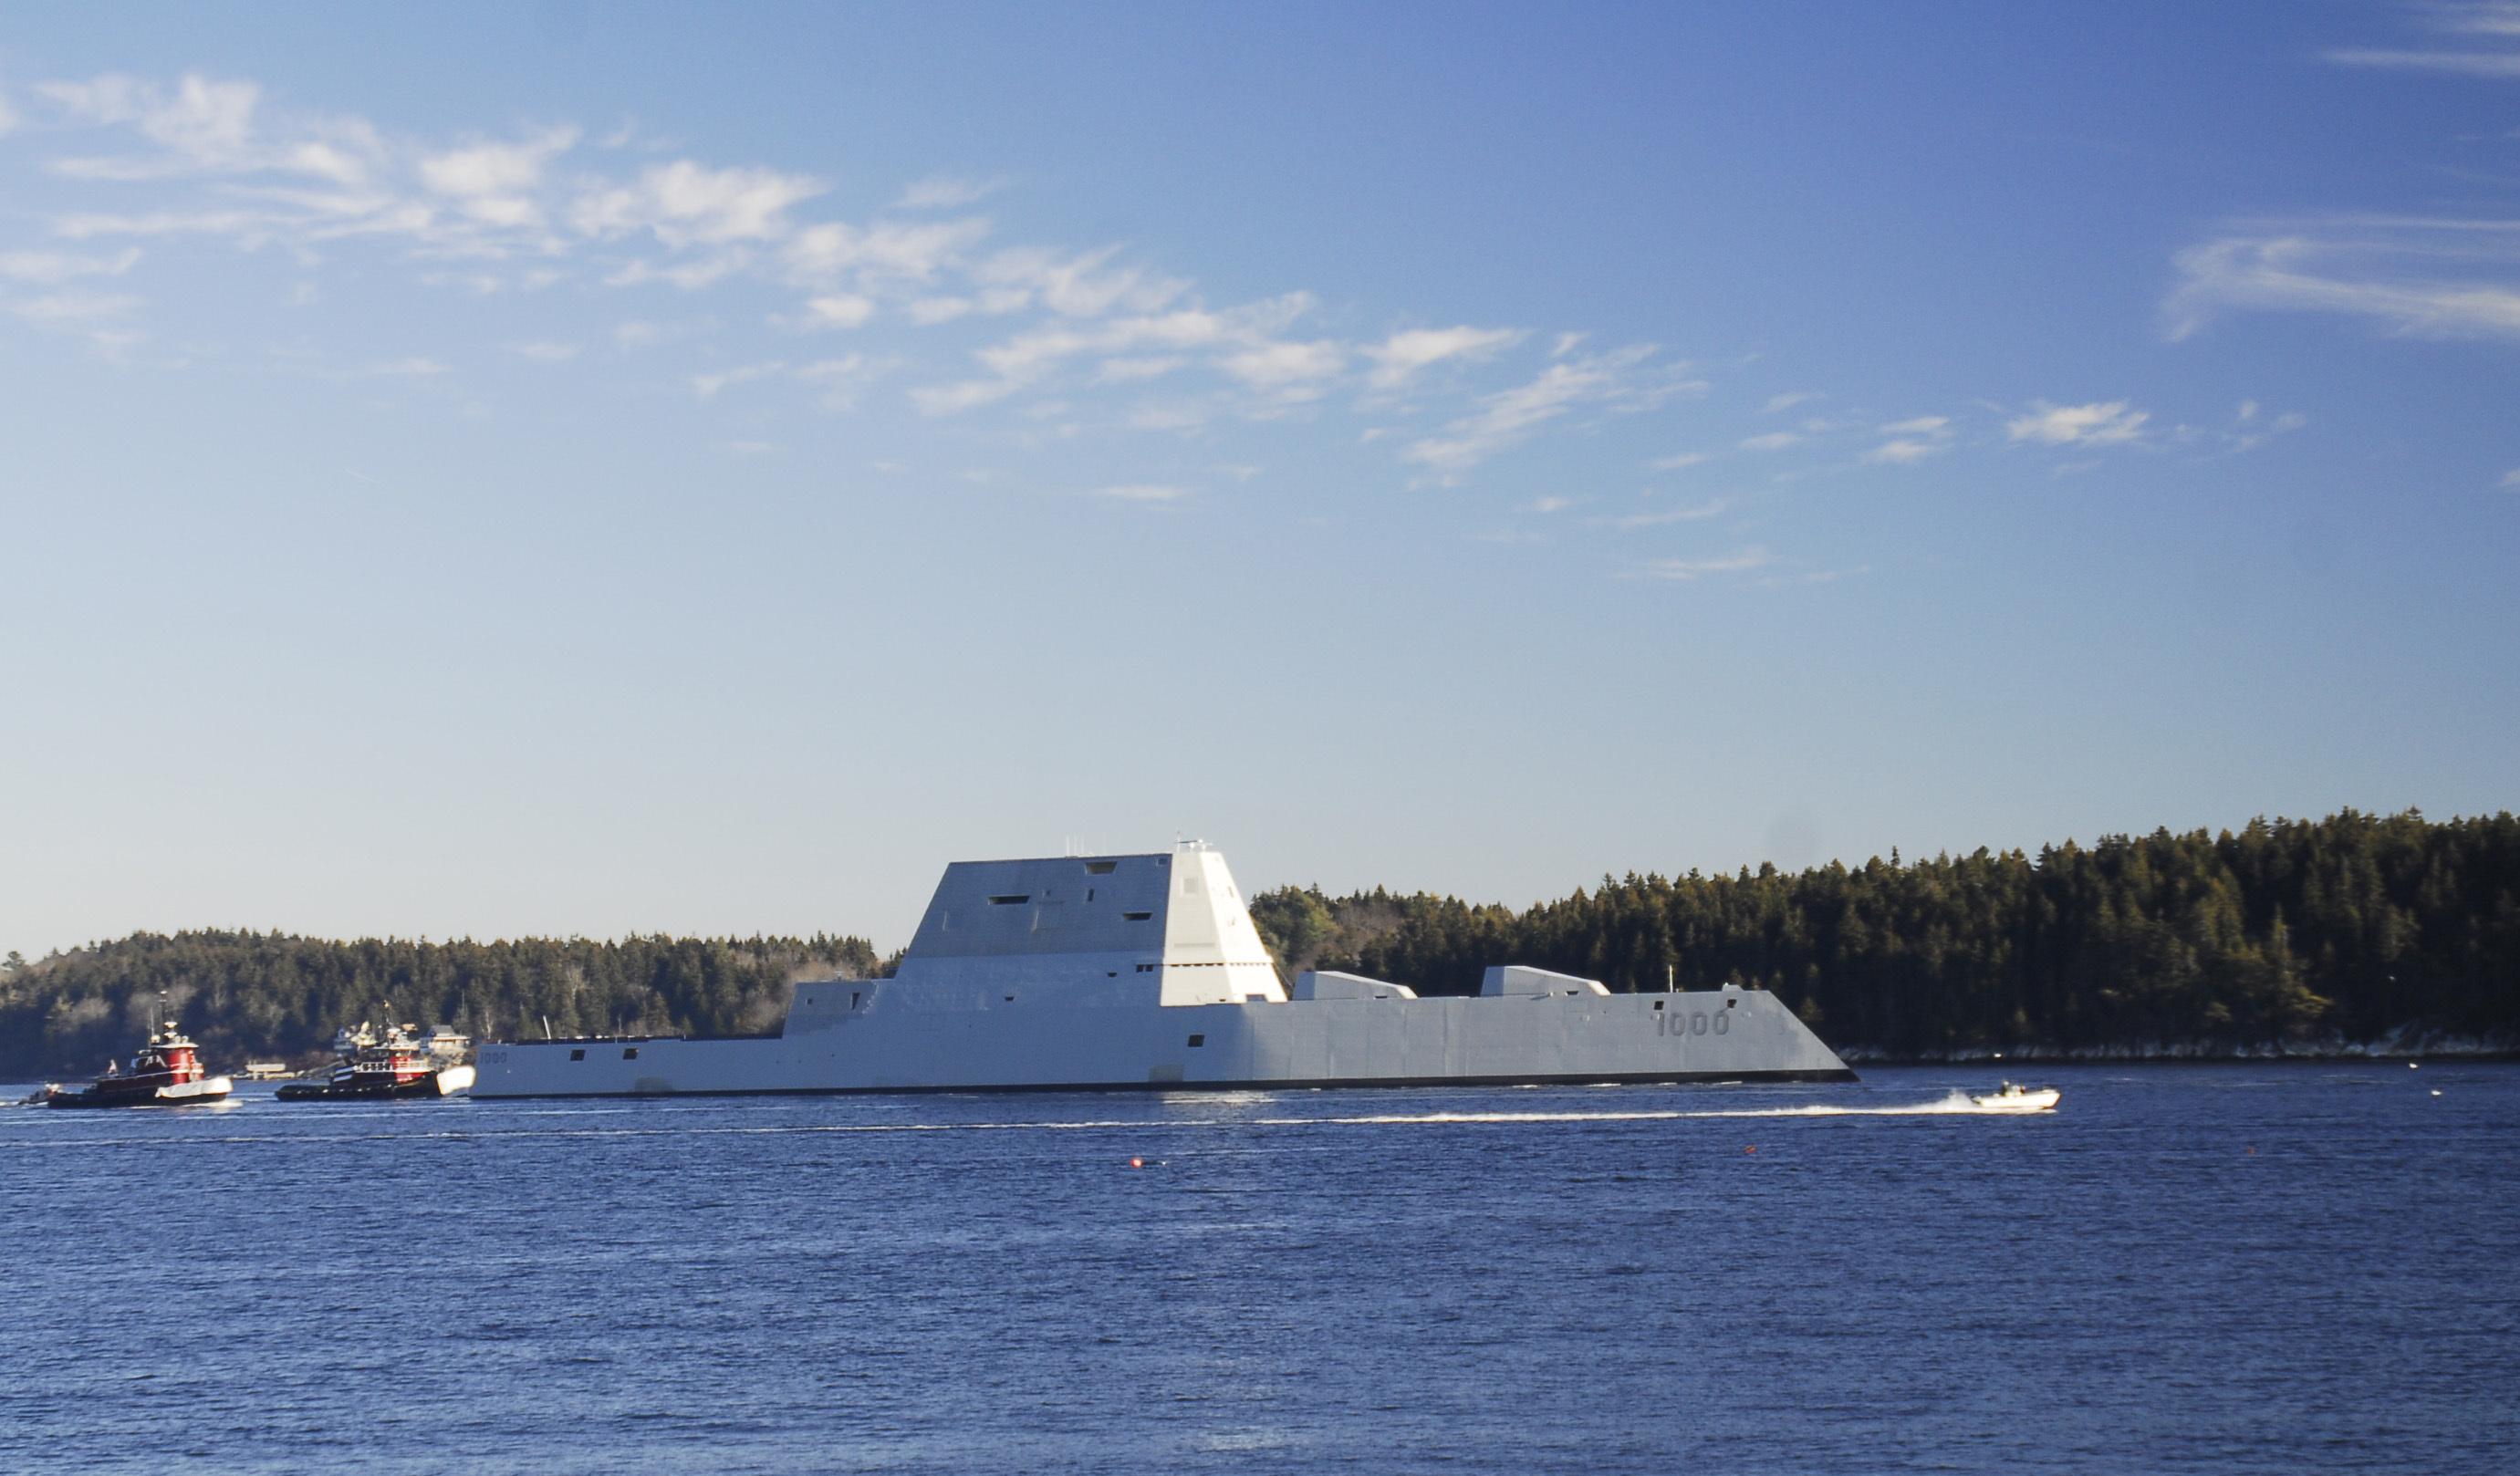 The USS Zumwalt, The Warship That Looks Like A Fishing Boat On Radar, Heads  To Sea   Inverse